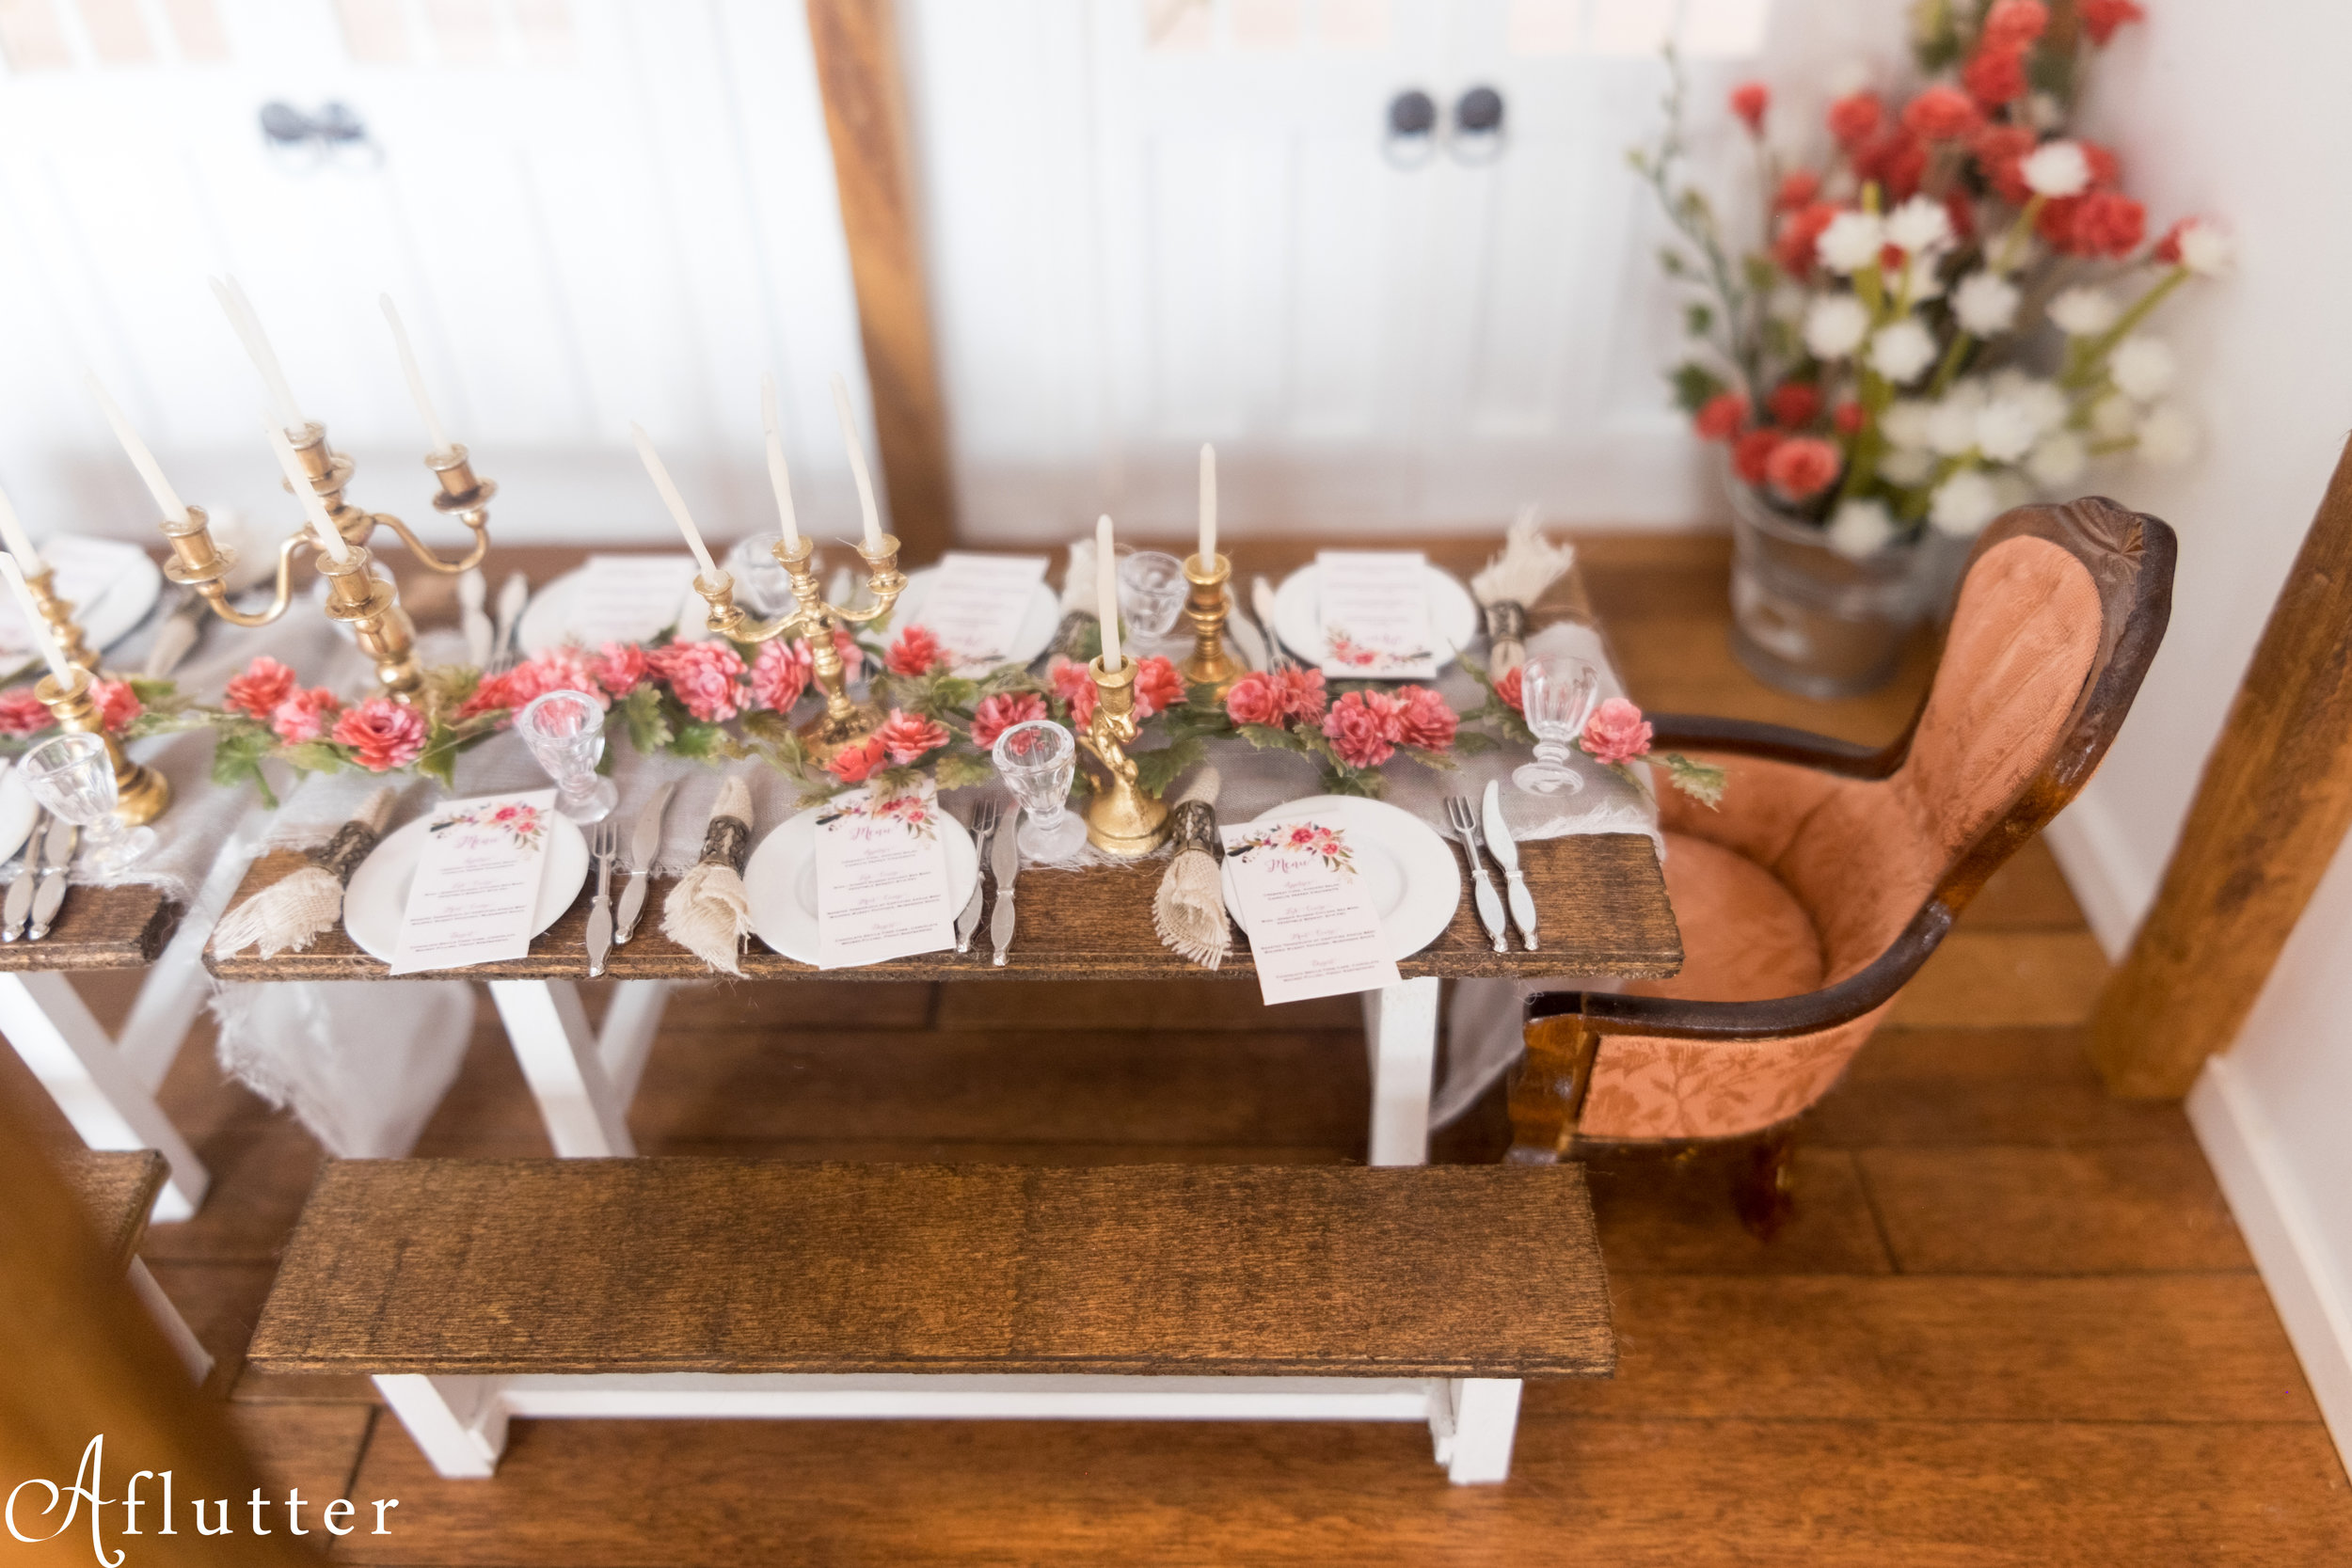 Brenul-Barn-Mini-Wedding-2-of-16.jpg